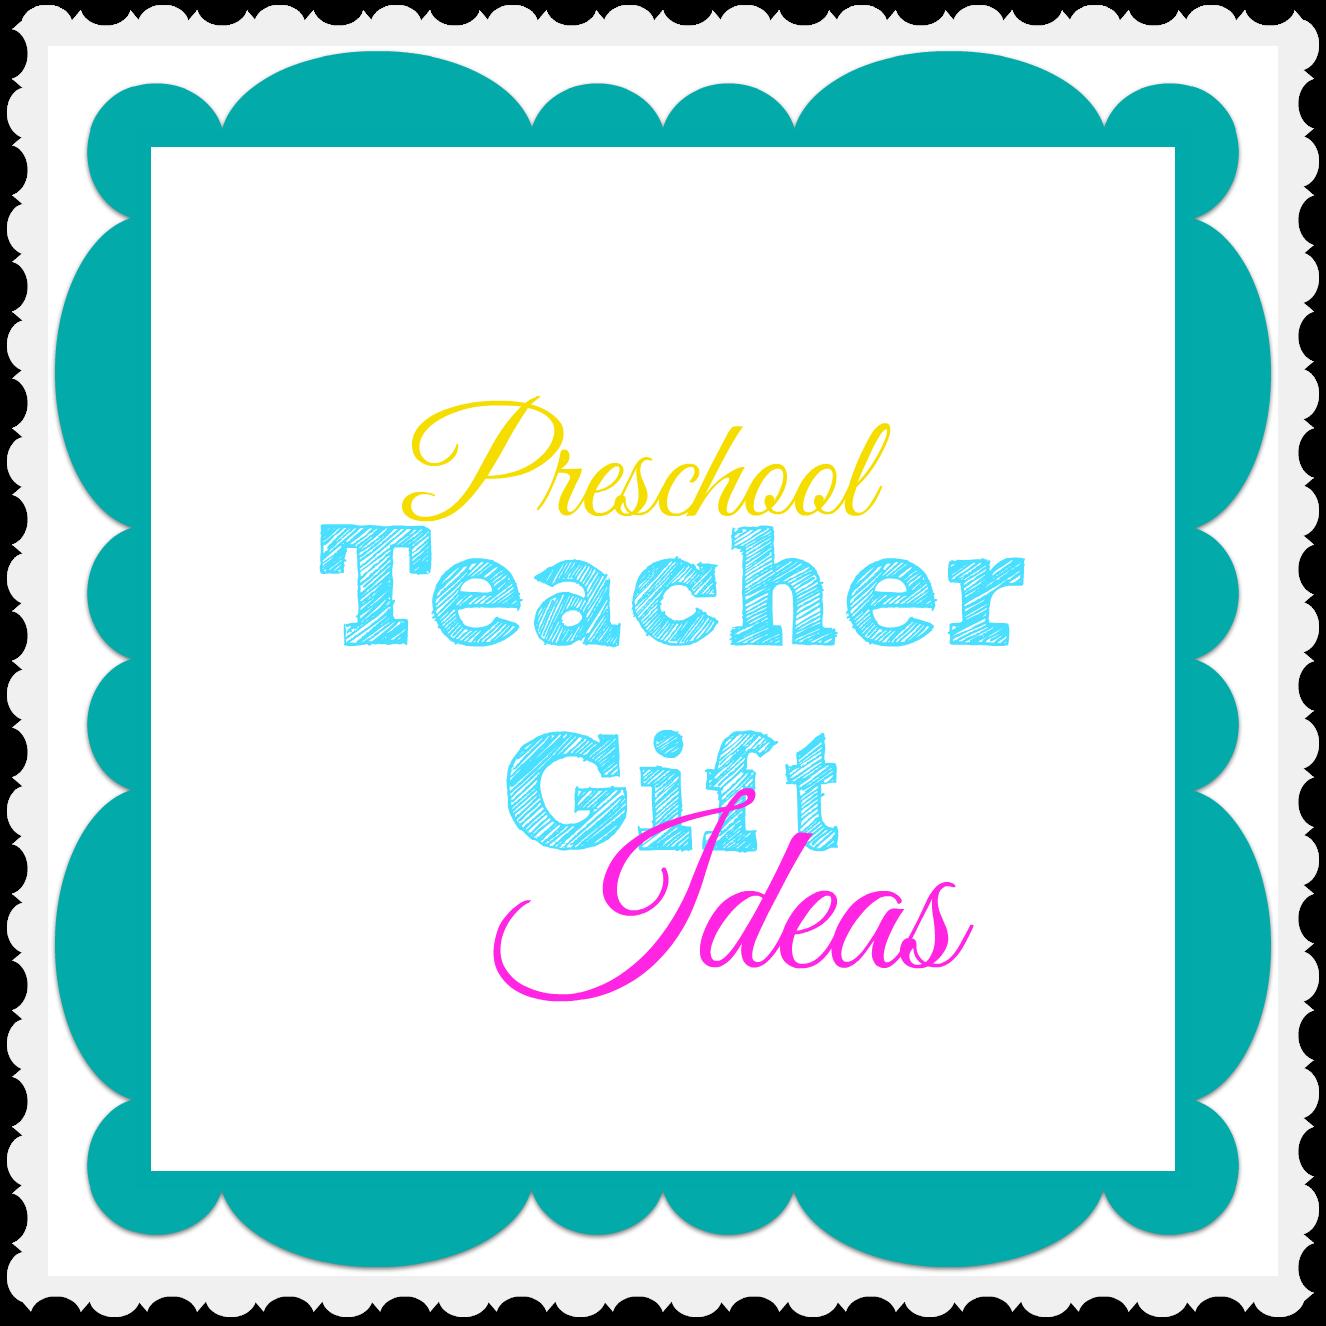 Classroom Ideas For Preschool Teachers : Preschool teacher gift ideas what mommy does